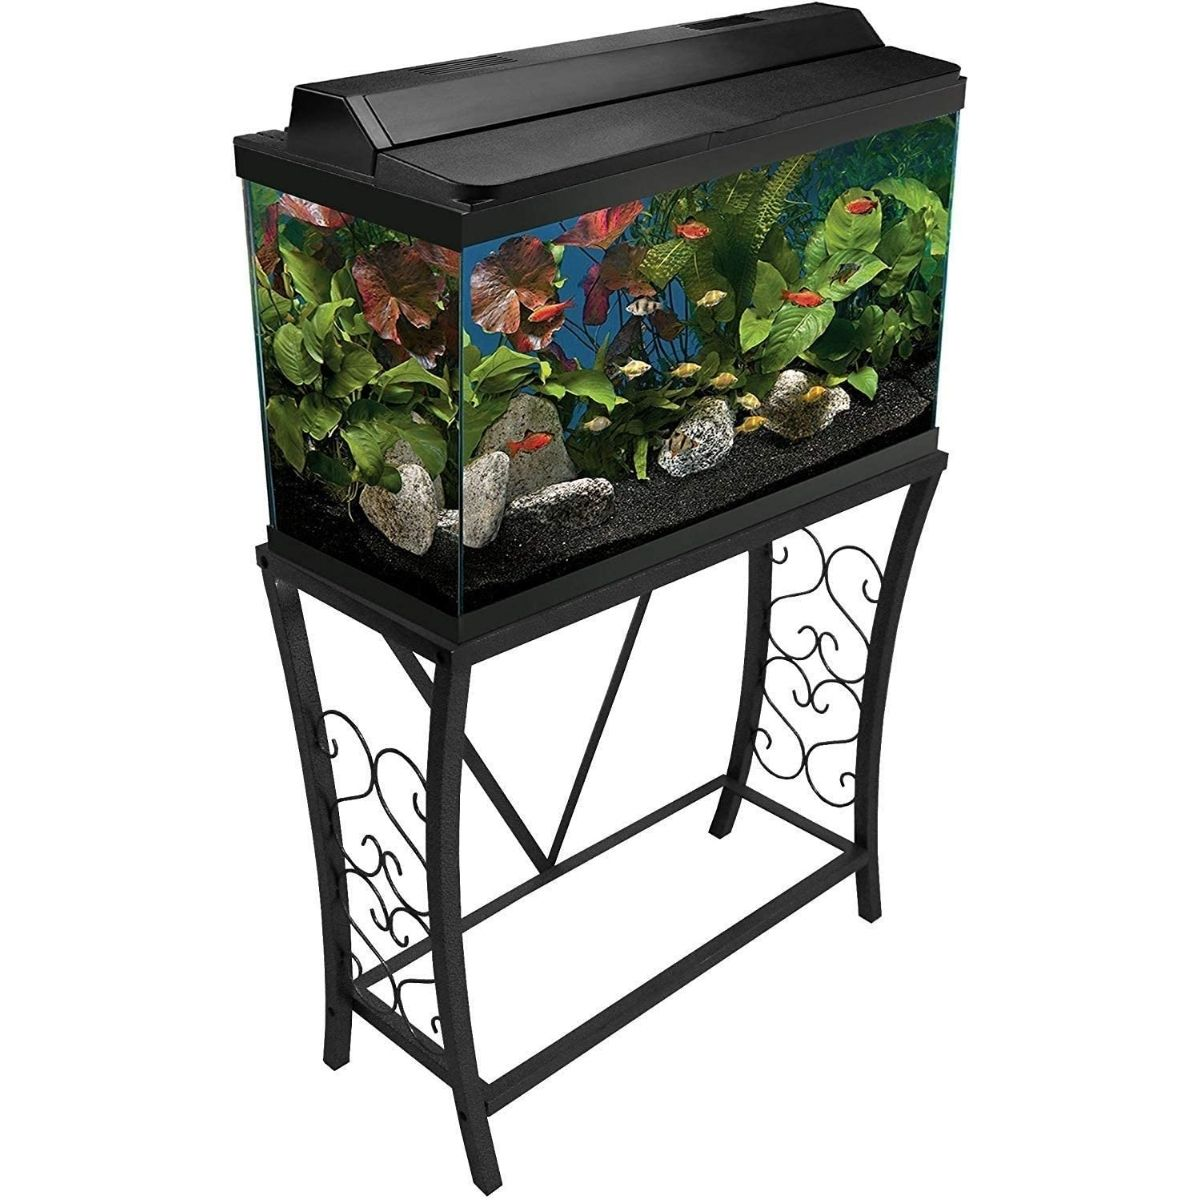 The Best 29 Gallon Aquarium Stand Option: Aquatic Fundamentals Metal Aquarium Stand